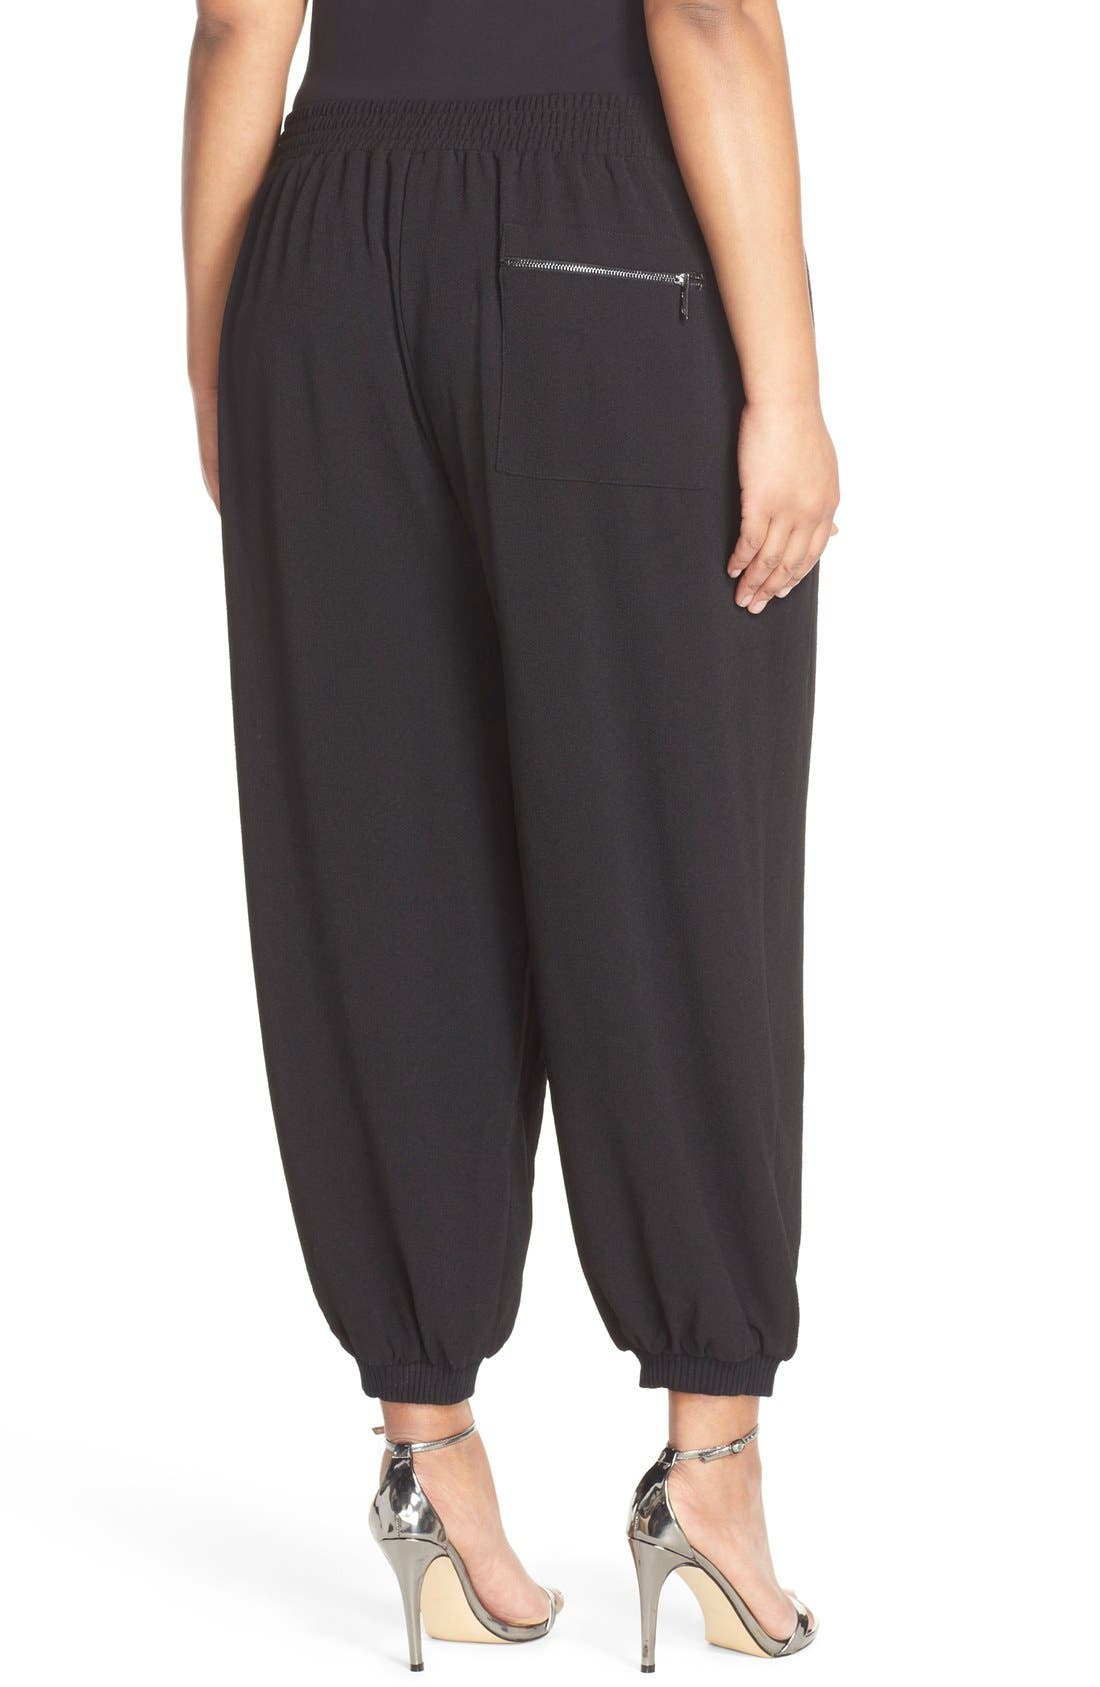 MELISSA MCCARTHY SEVEN7, Zip Pocket Harem Pants, Alternate thumbnail 3, color, 001